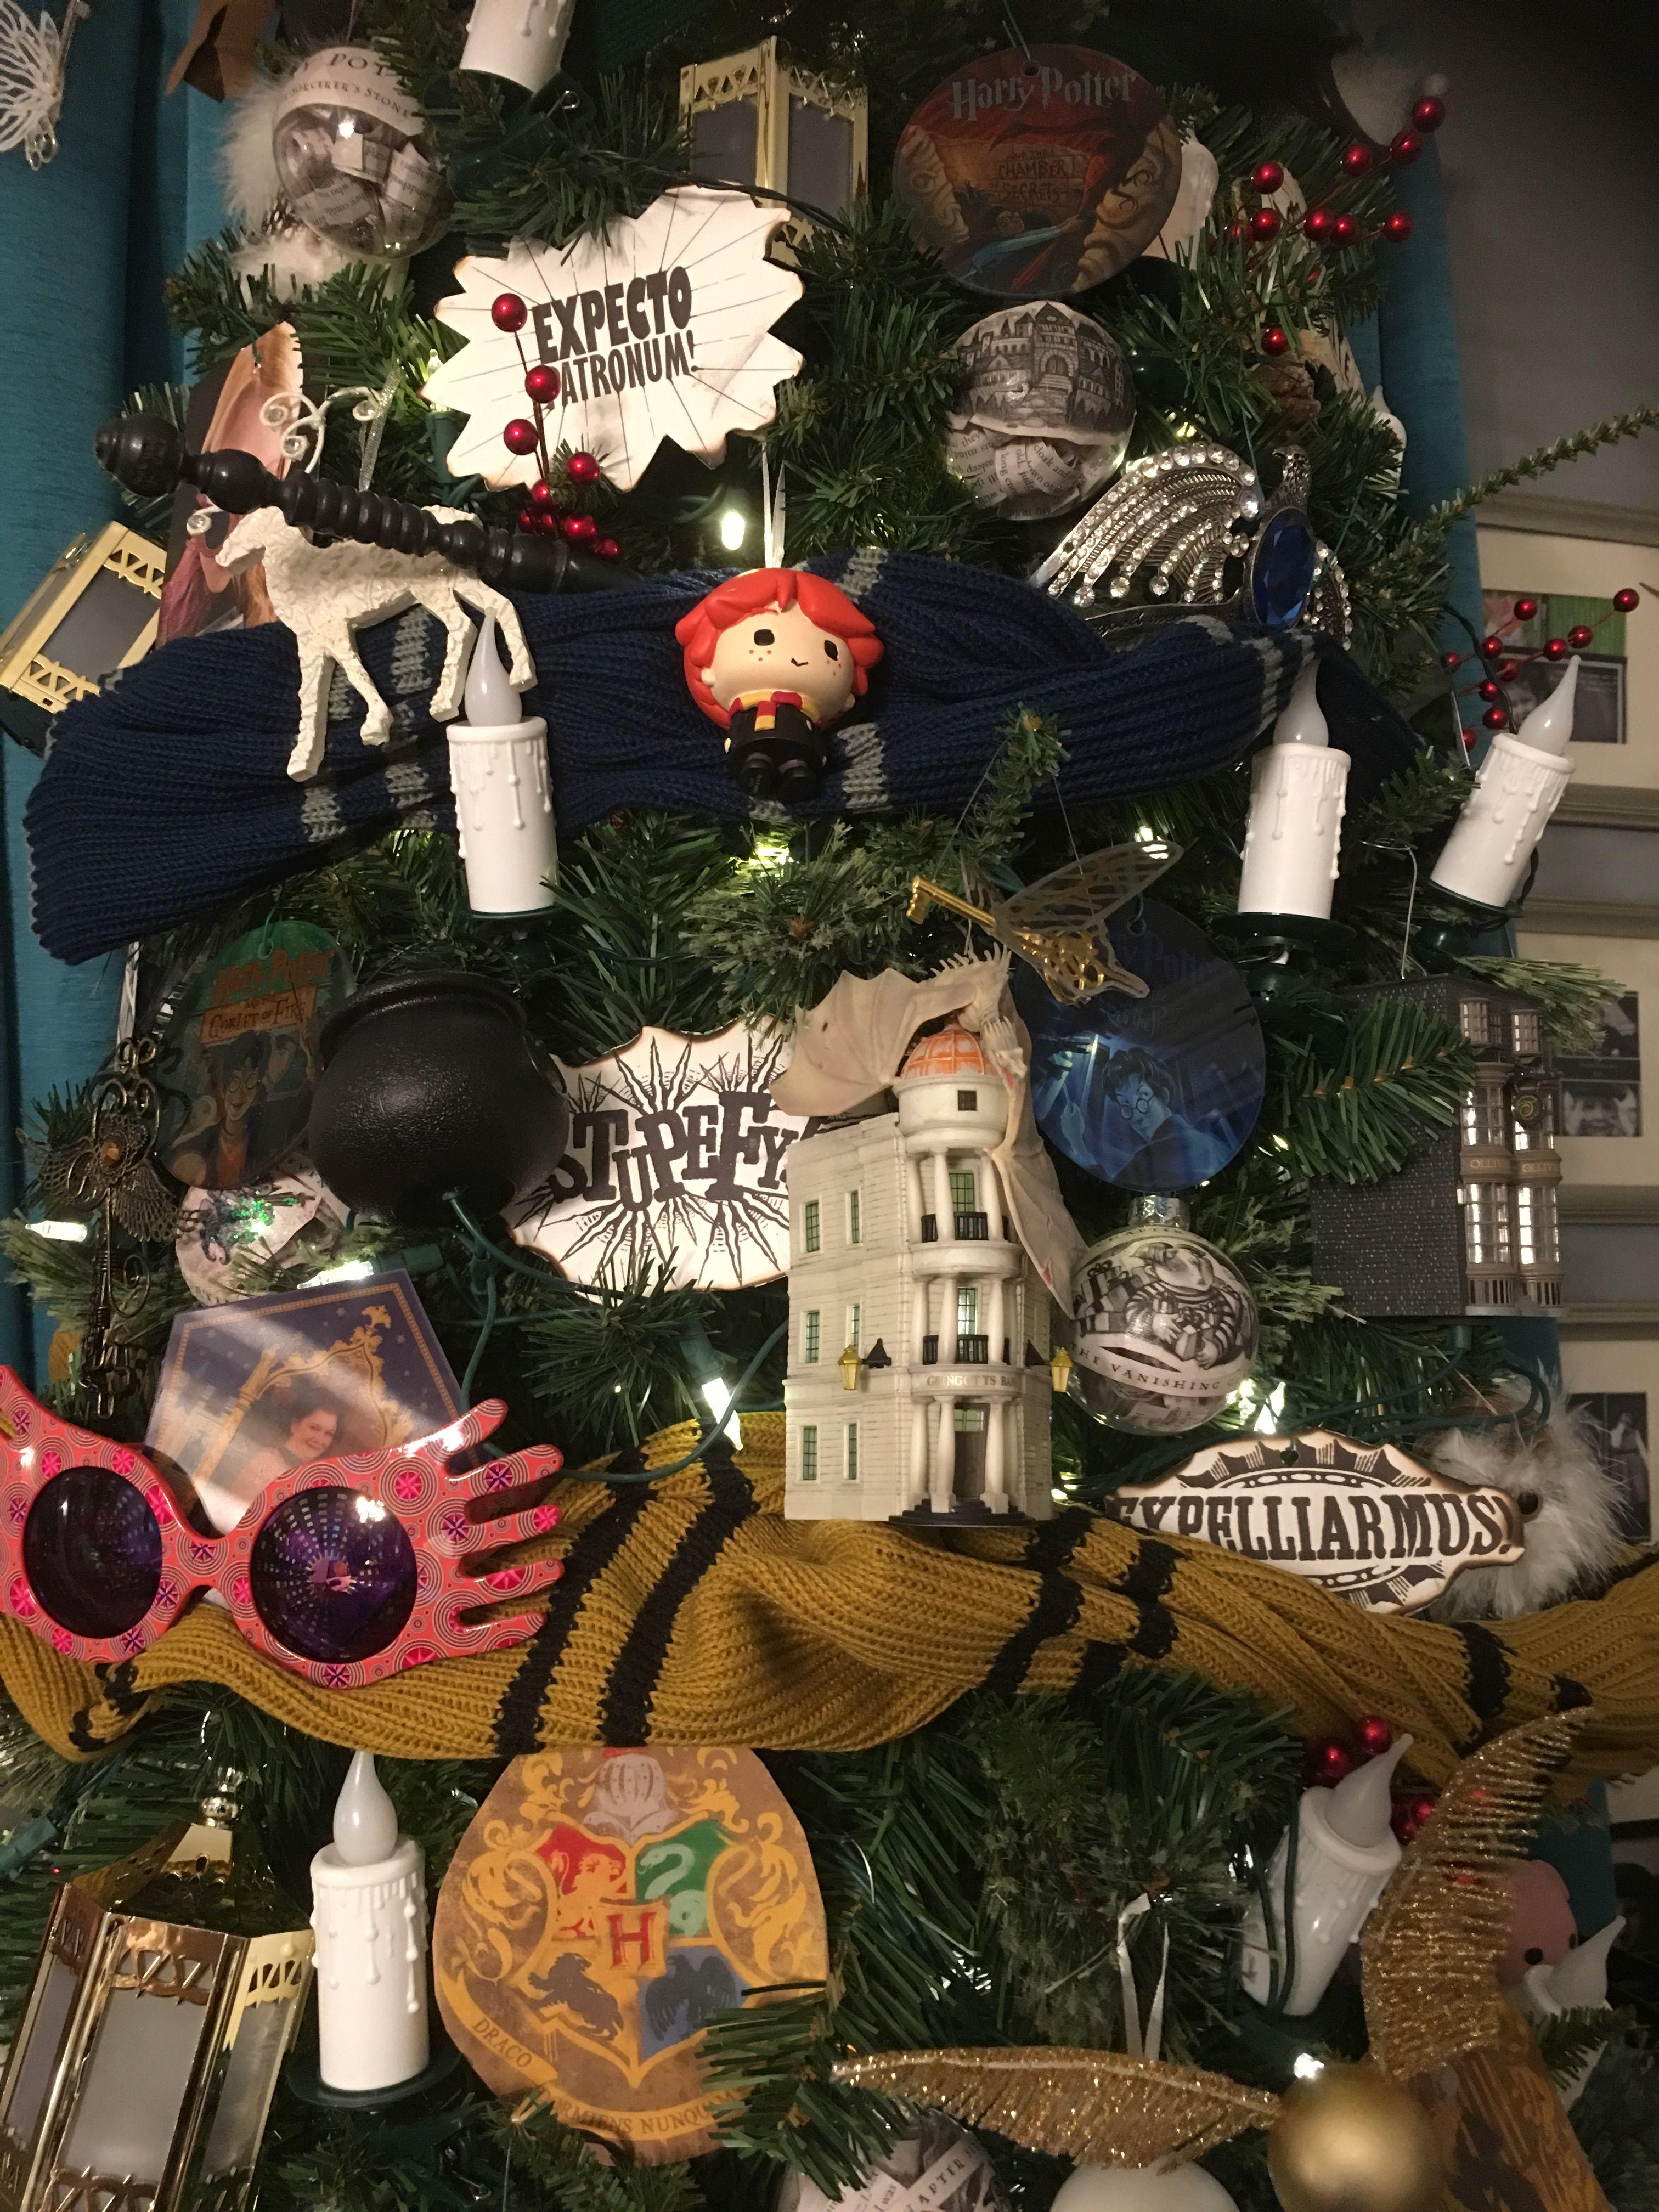 Harry Potter Christmas Tree Harrypottercharacters Brookers In